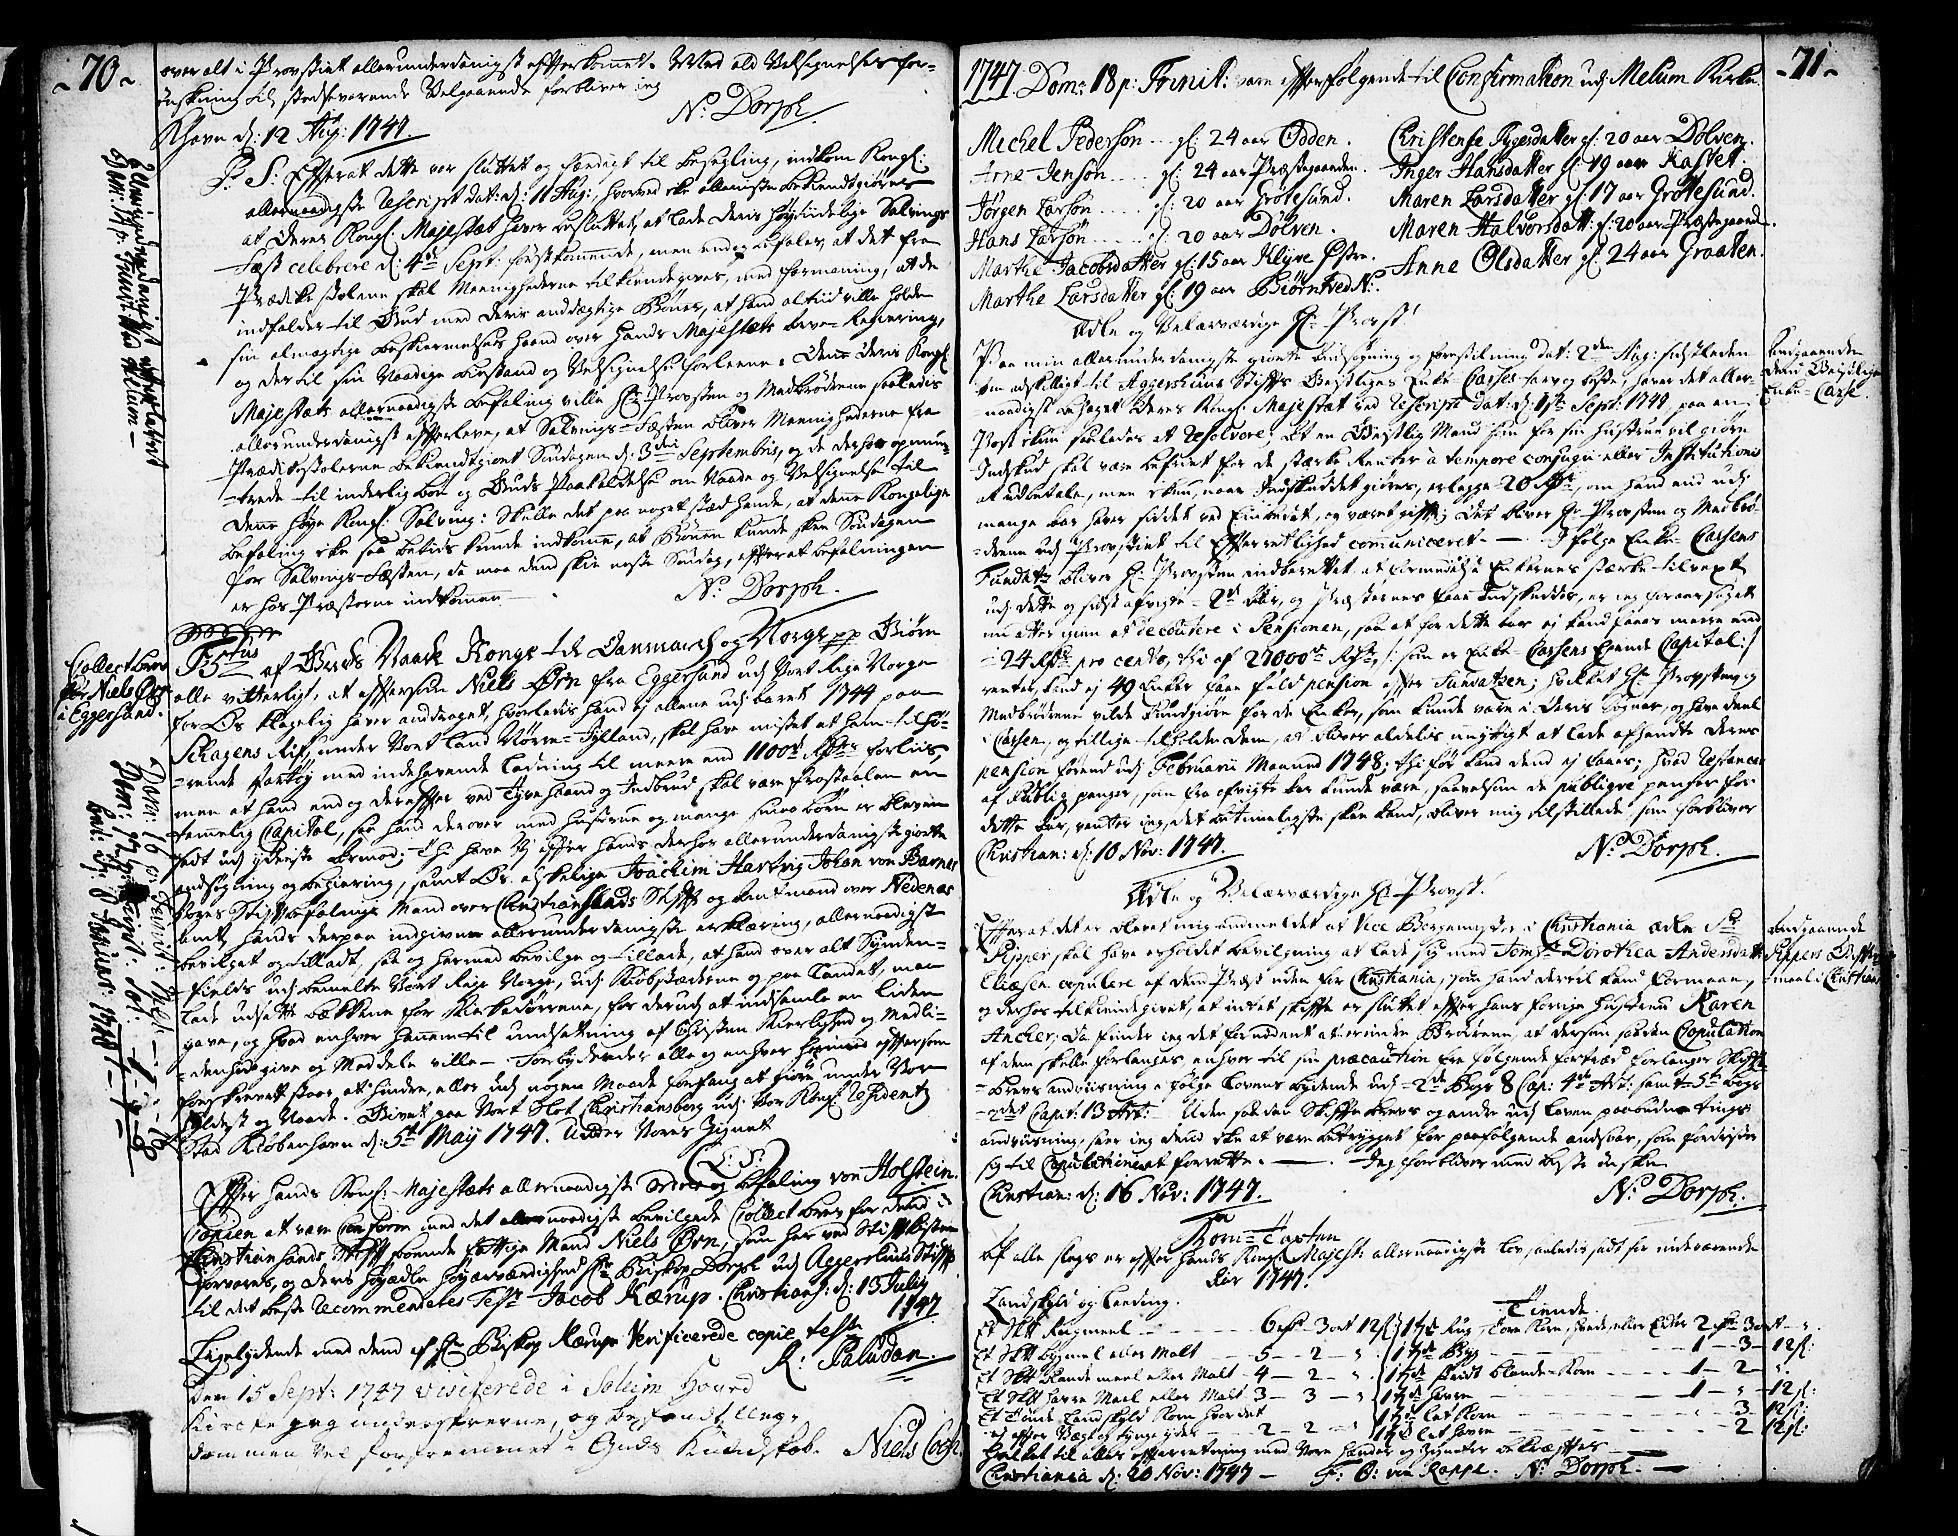 SAKO, Solum sokneprestkontor, A/Aa/L0002: Annen kirkebok nr. 2, 1743-1791, s. 70-71